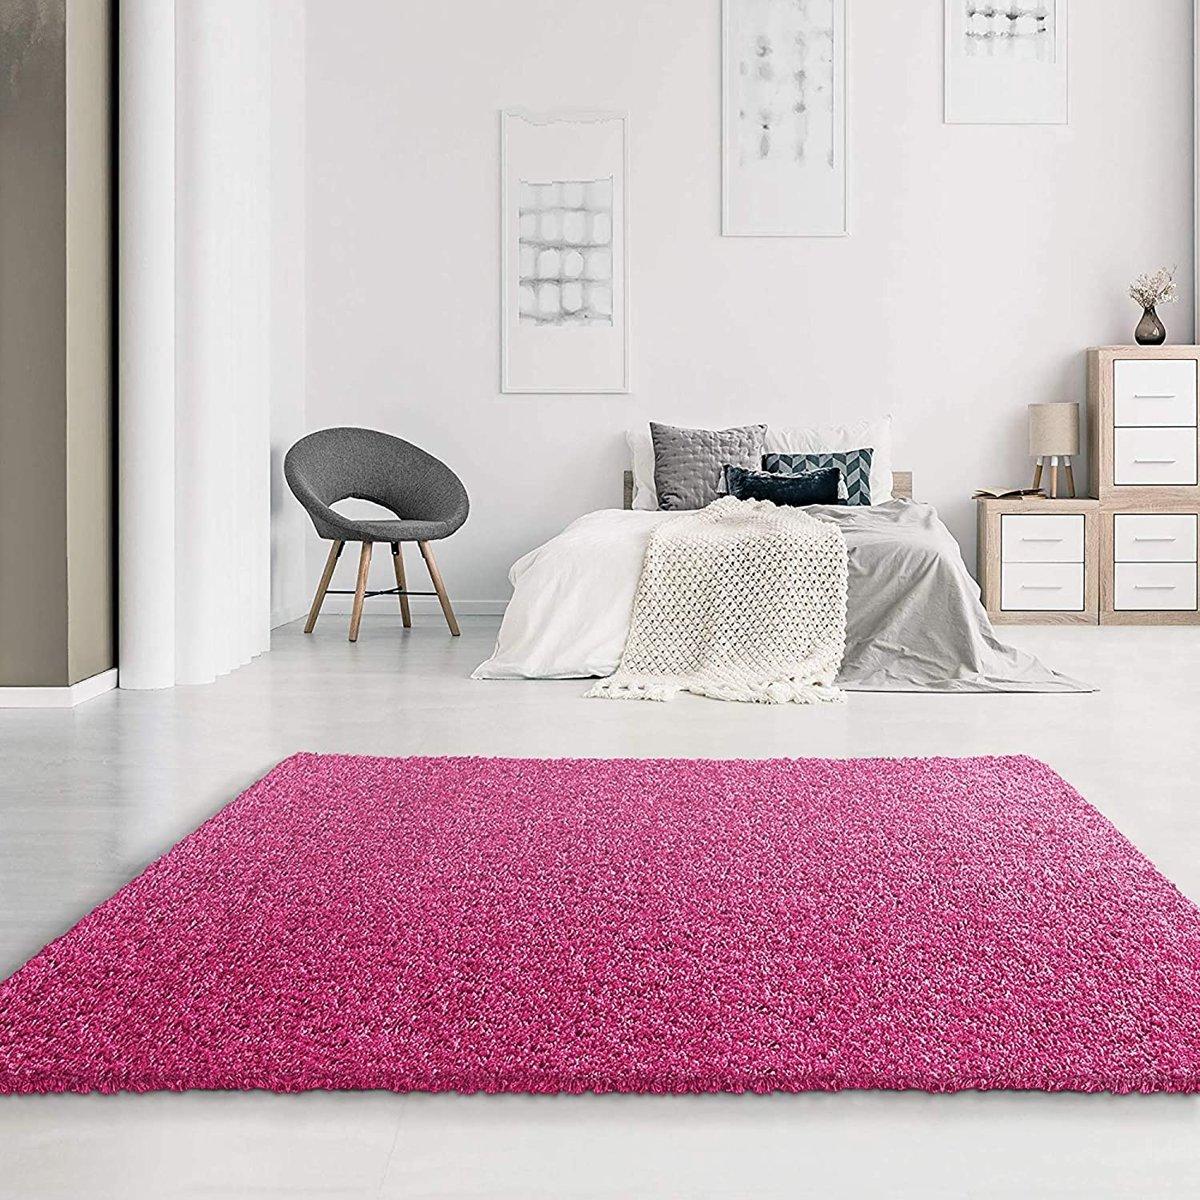 Ronde Vloerkleed Goedkoop : Bol hoogpolig shaggy vloerkleed loca cm roze